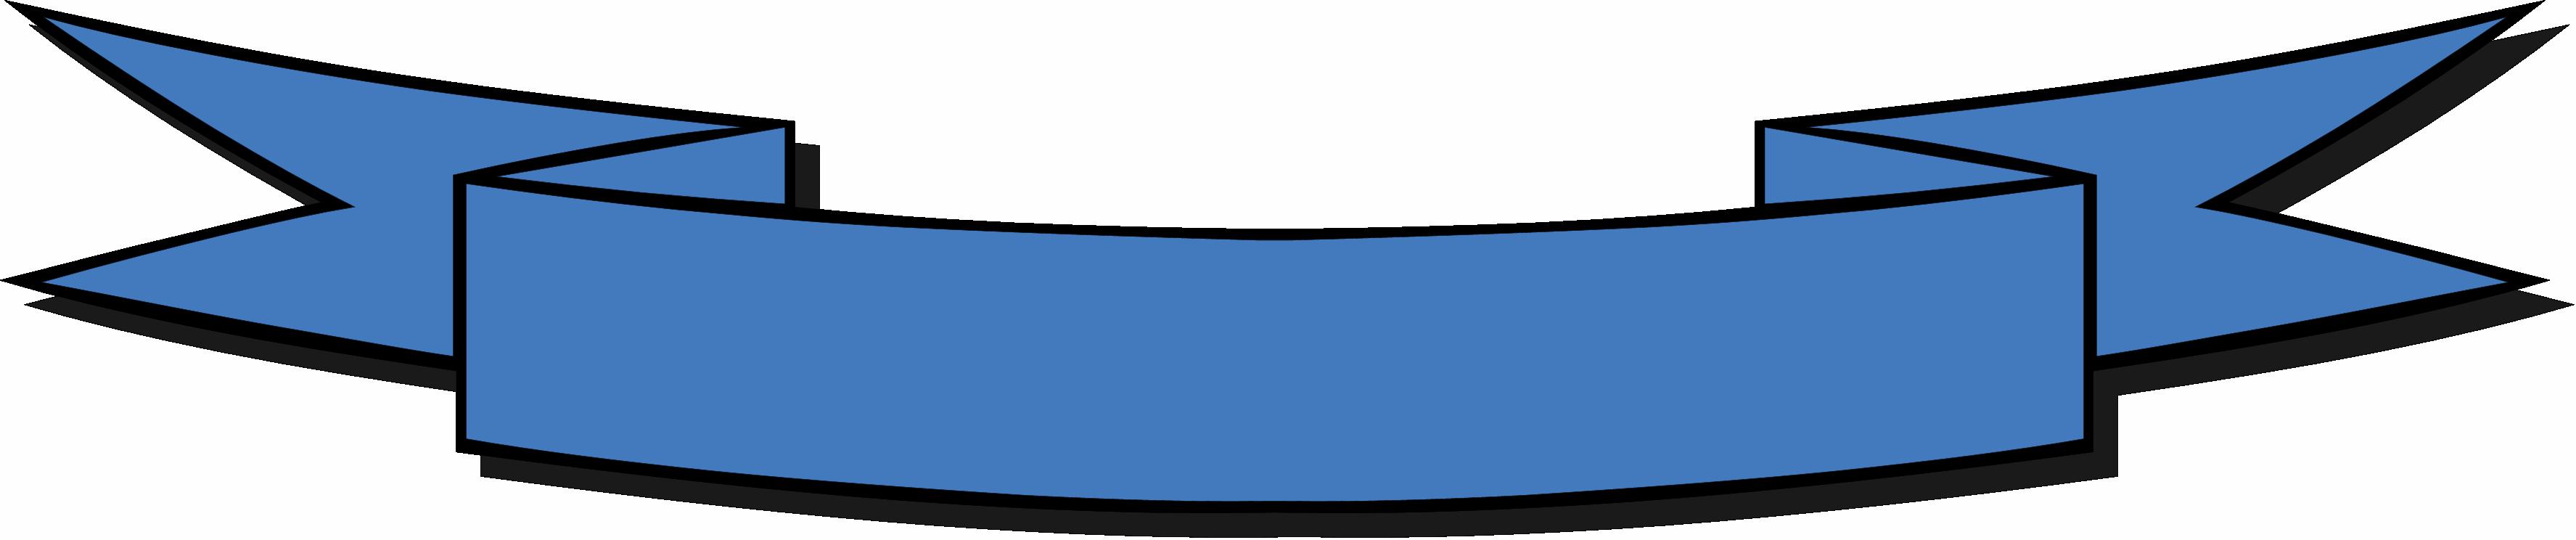 Blue Ribbon Banner Clip Art